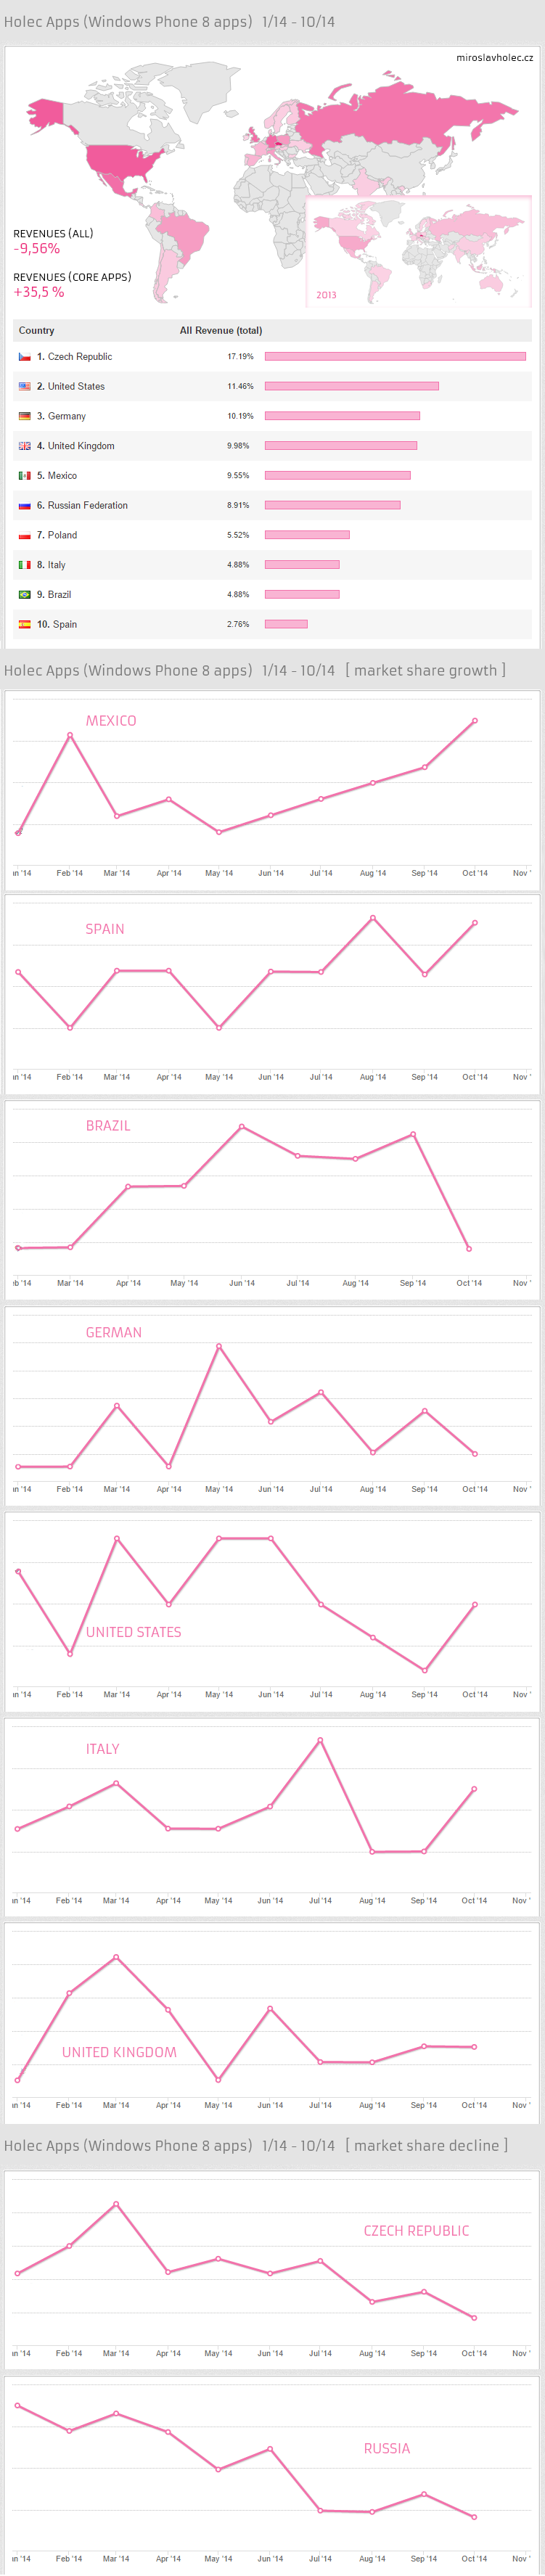 Windows Phone Market Share (Holec Apps)